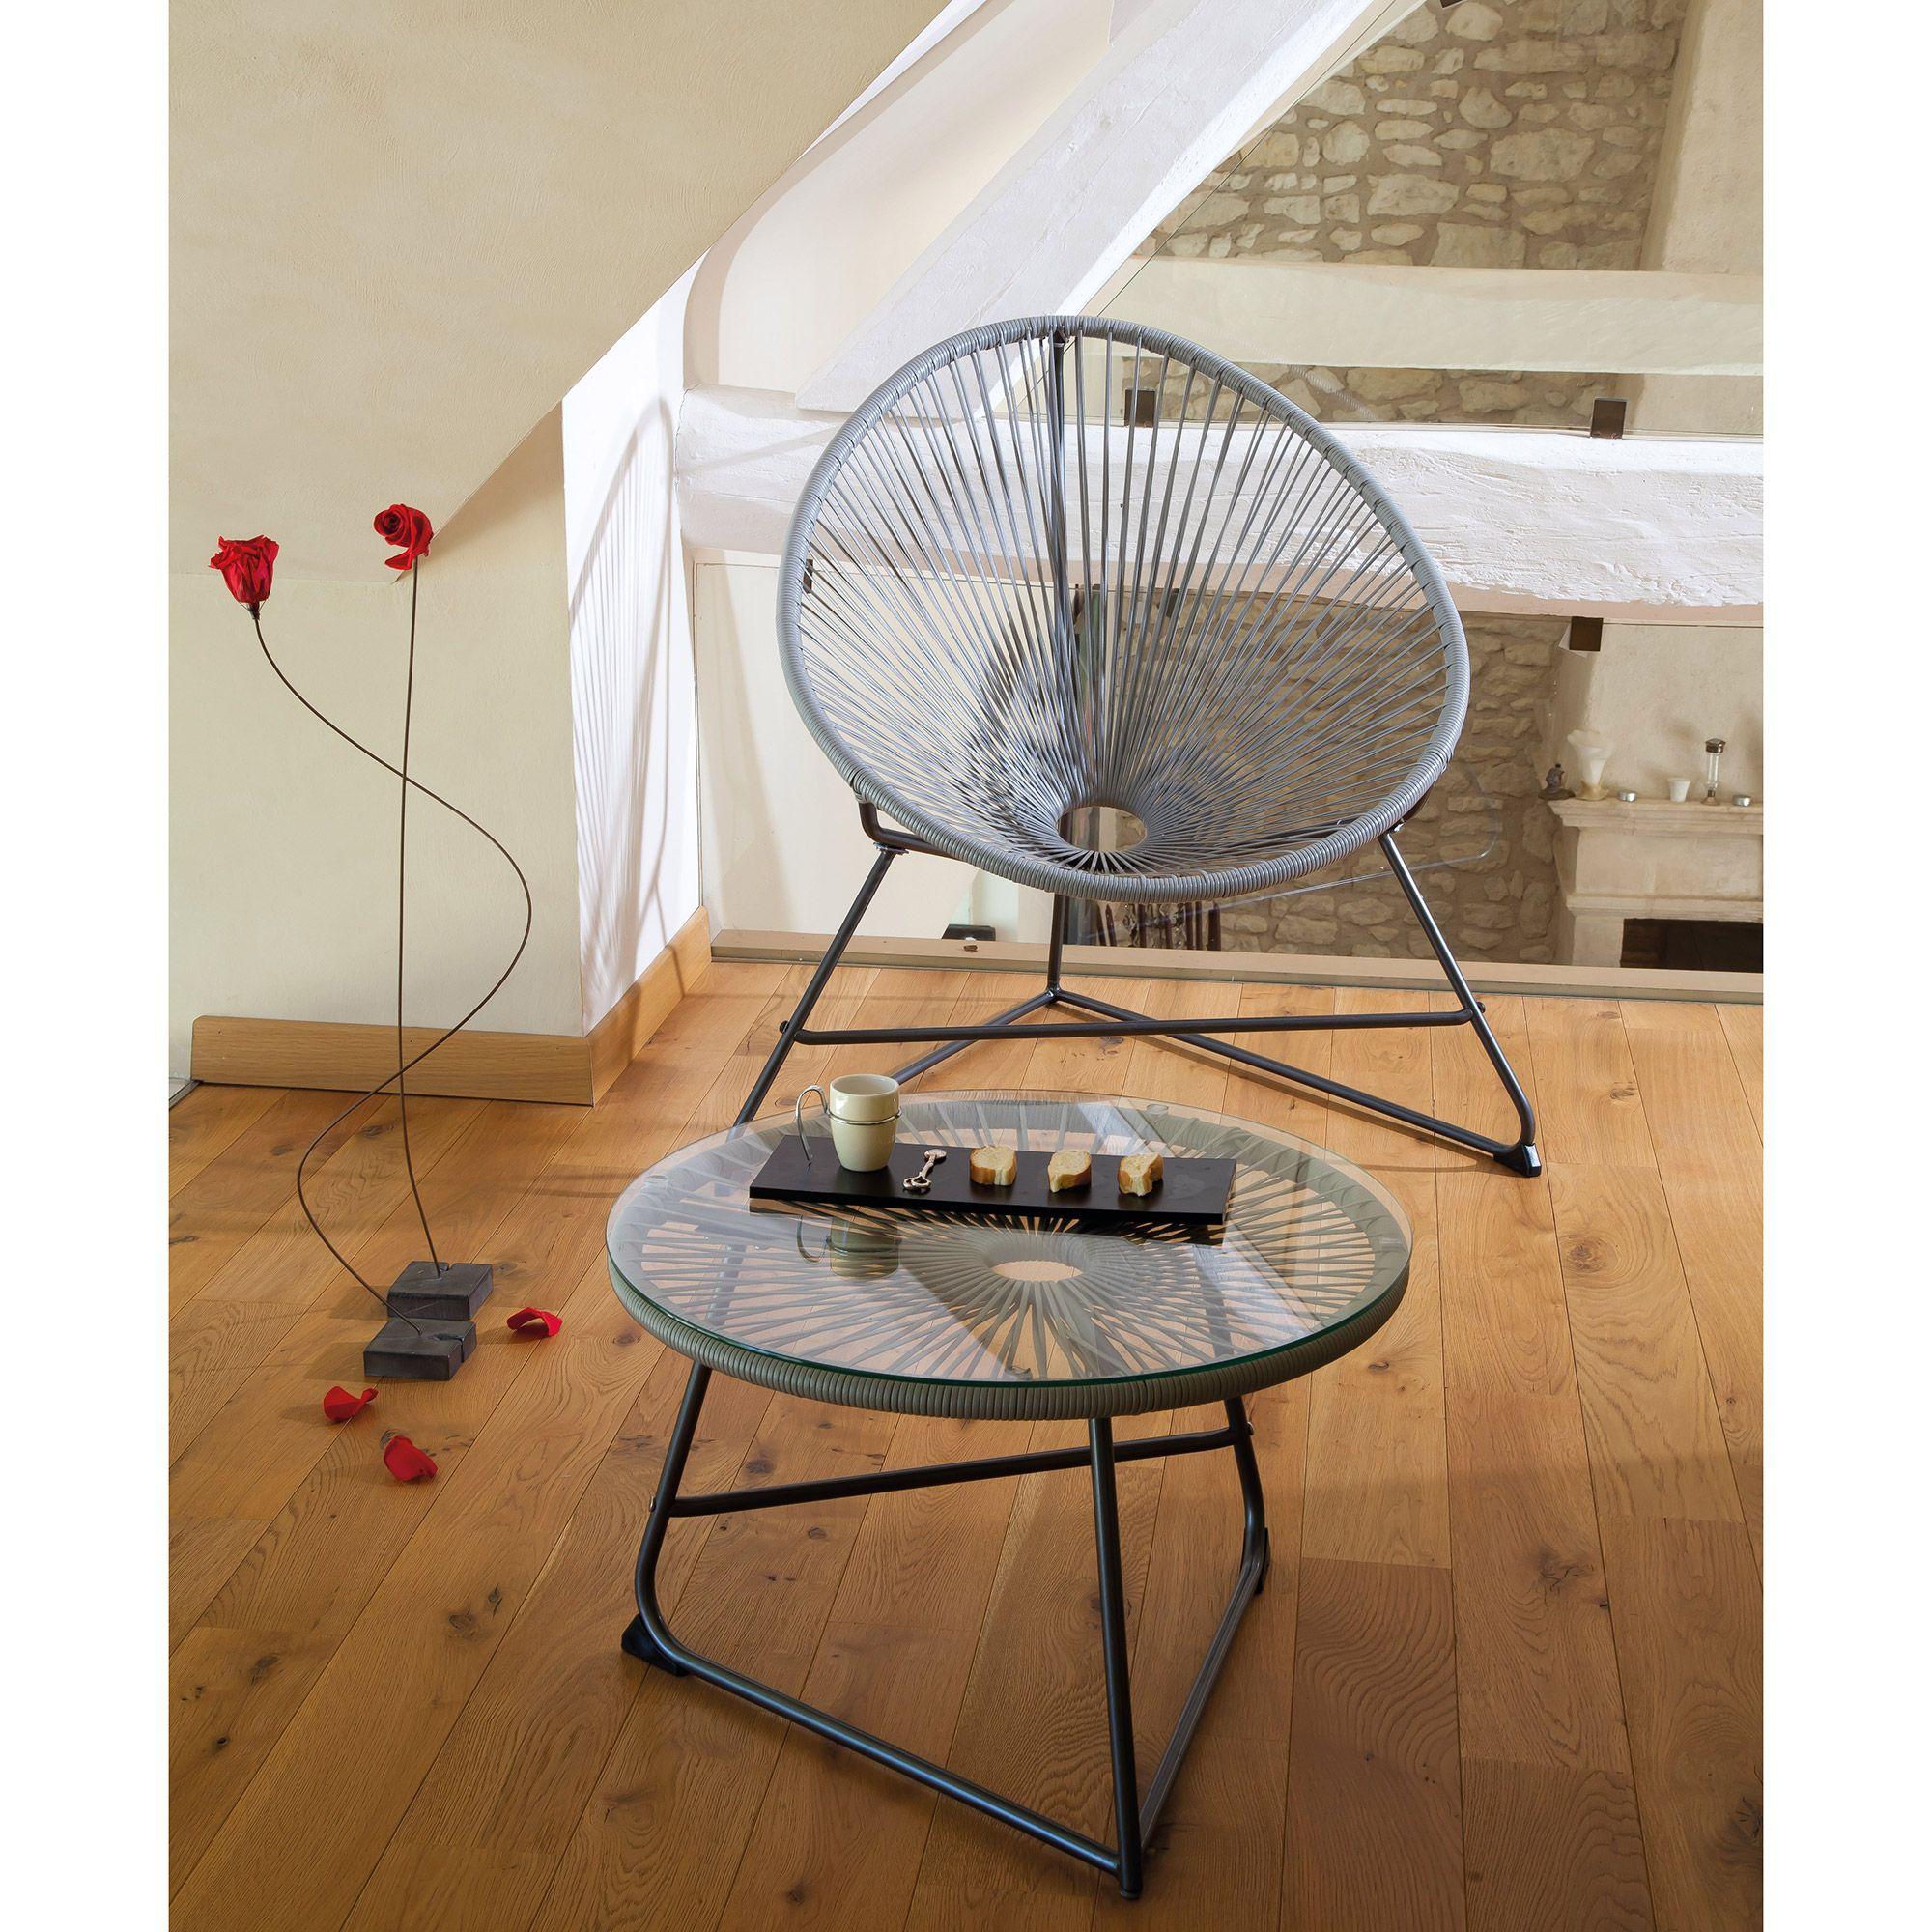 Fauteuil Relax En Aluminium Polypropylene Polo Proloisirs Chaise De Jardin Fauteuil Relax Chaise